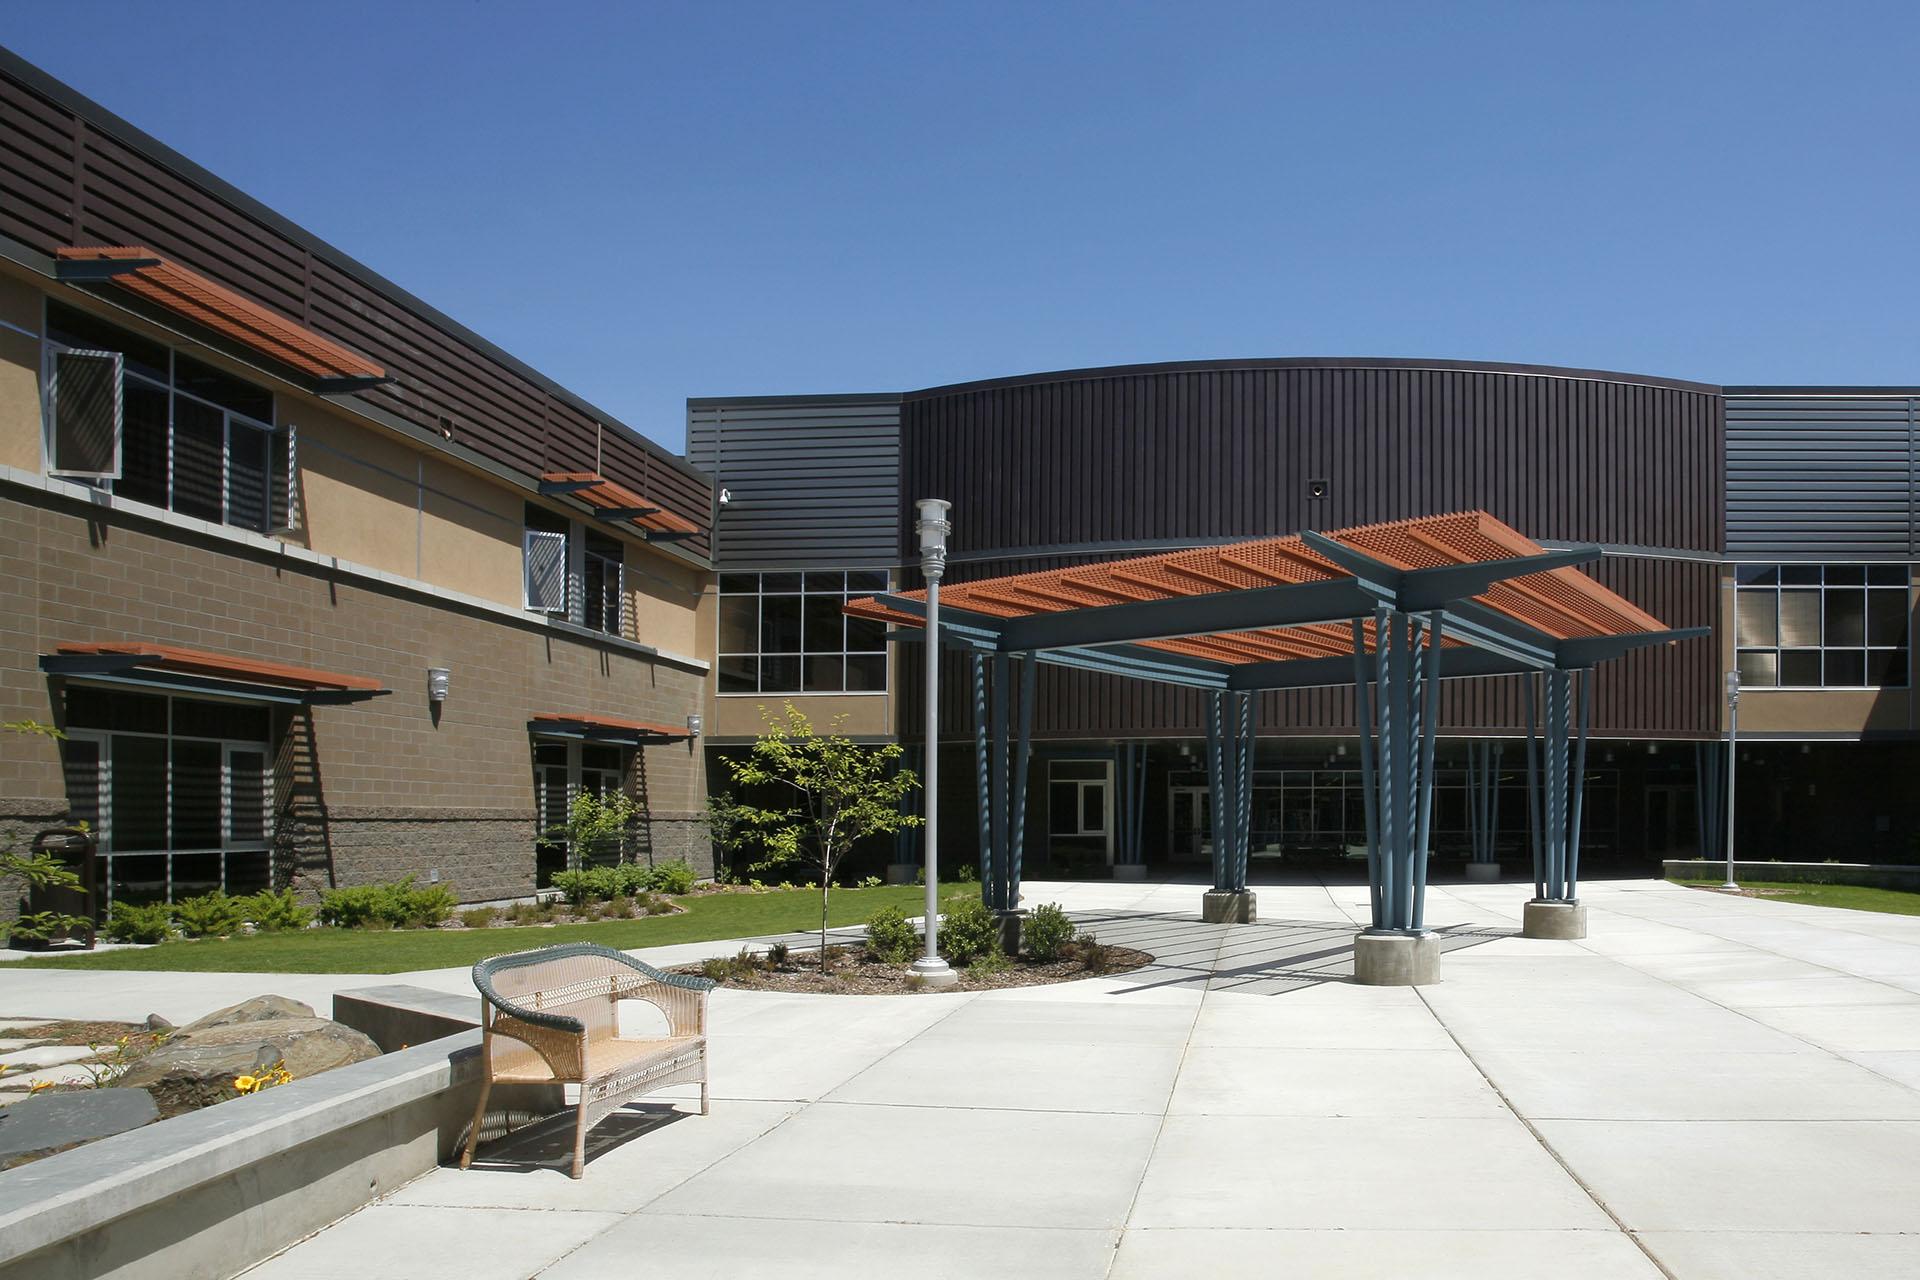 West Valley HS Courtyard